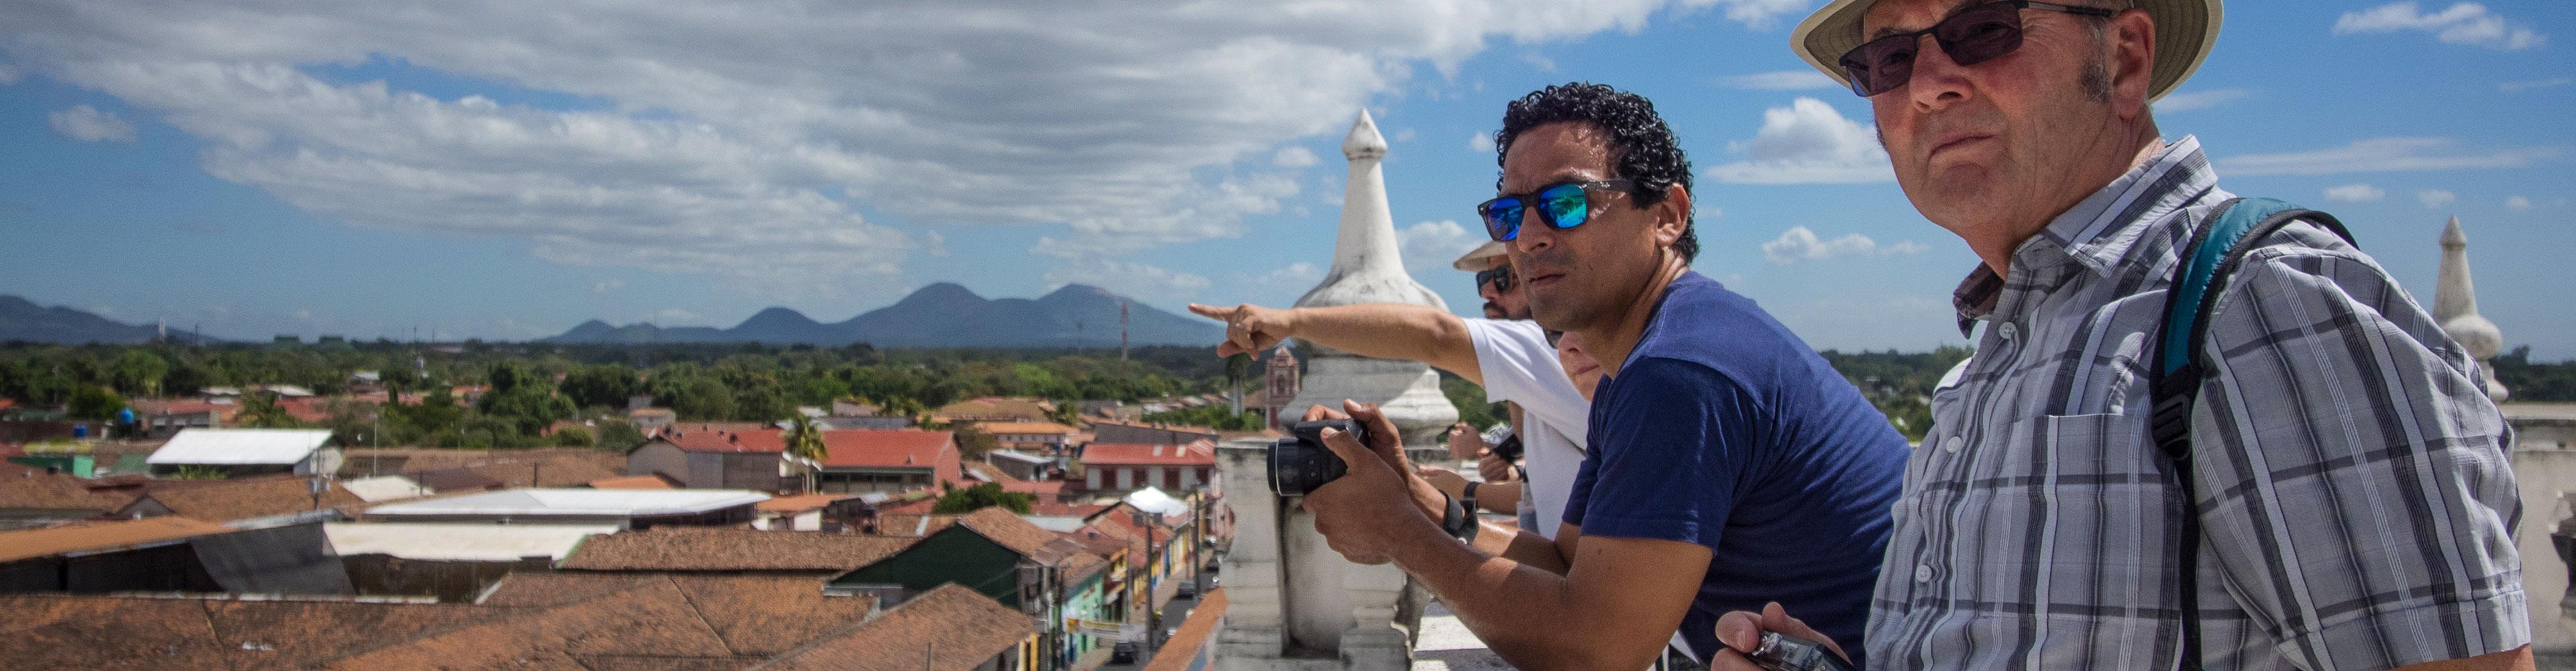 Amazing Central America